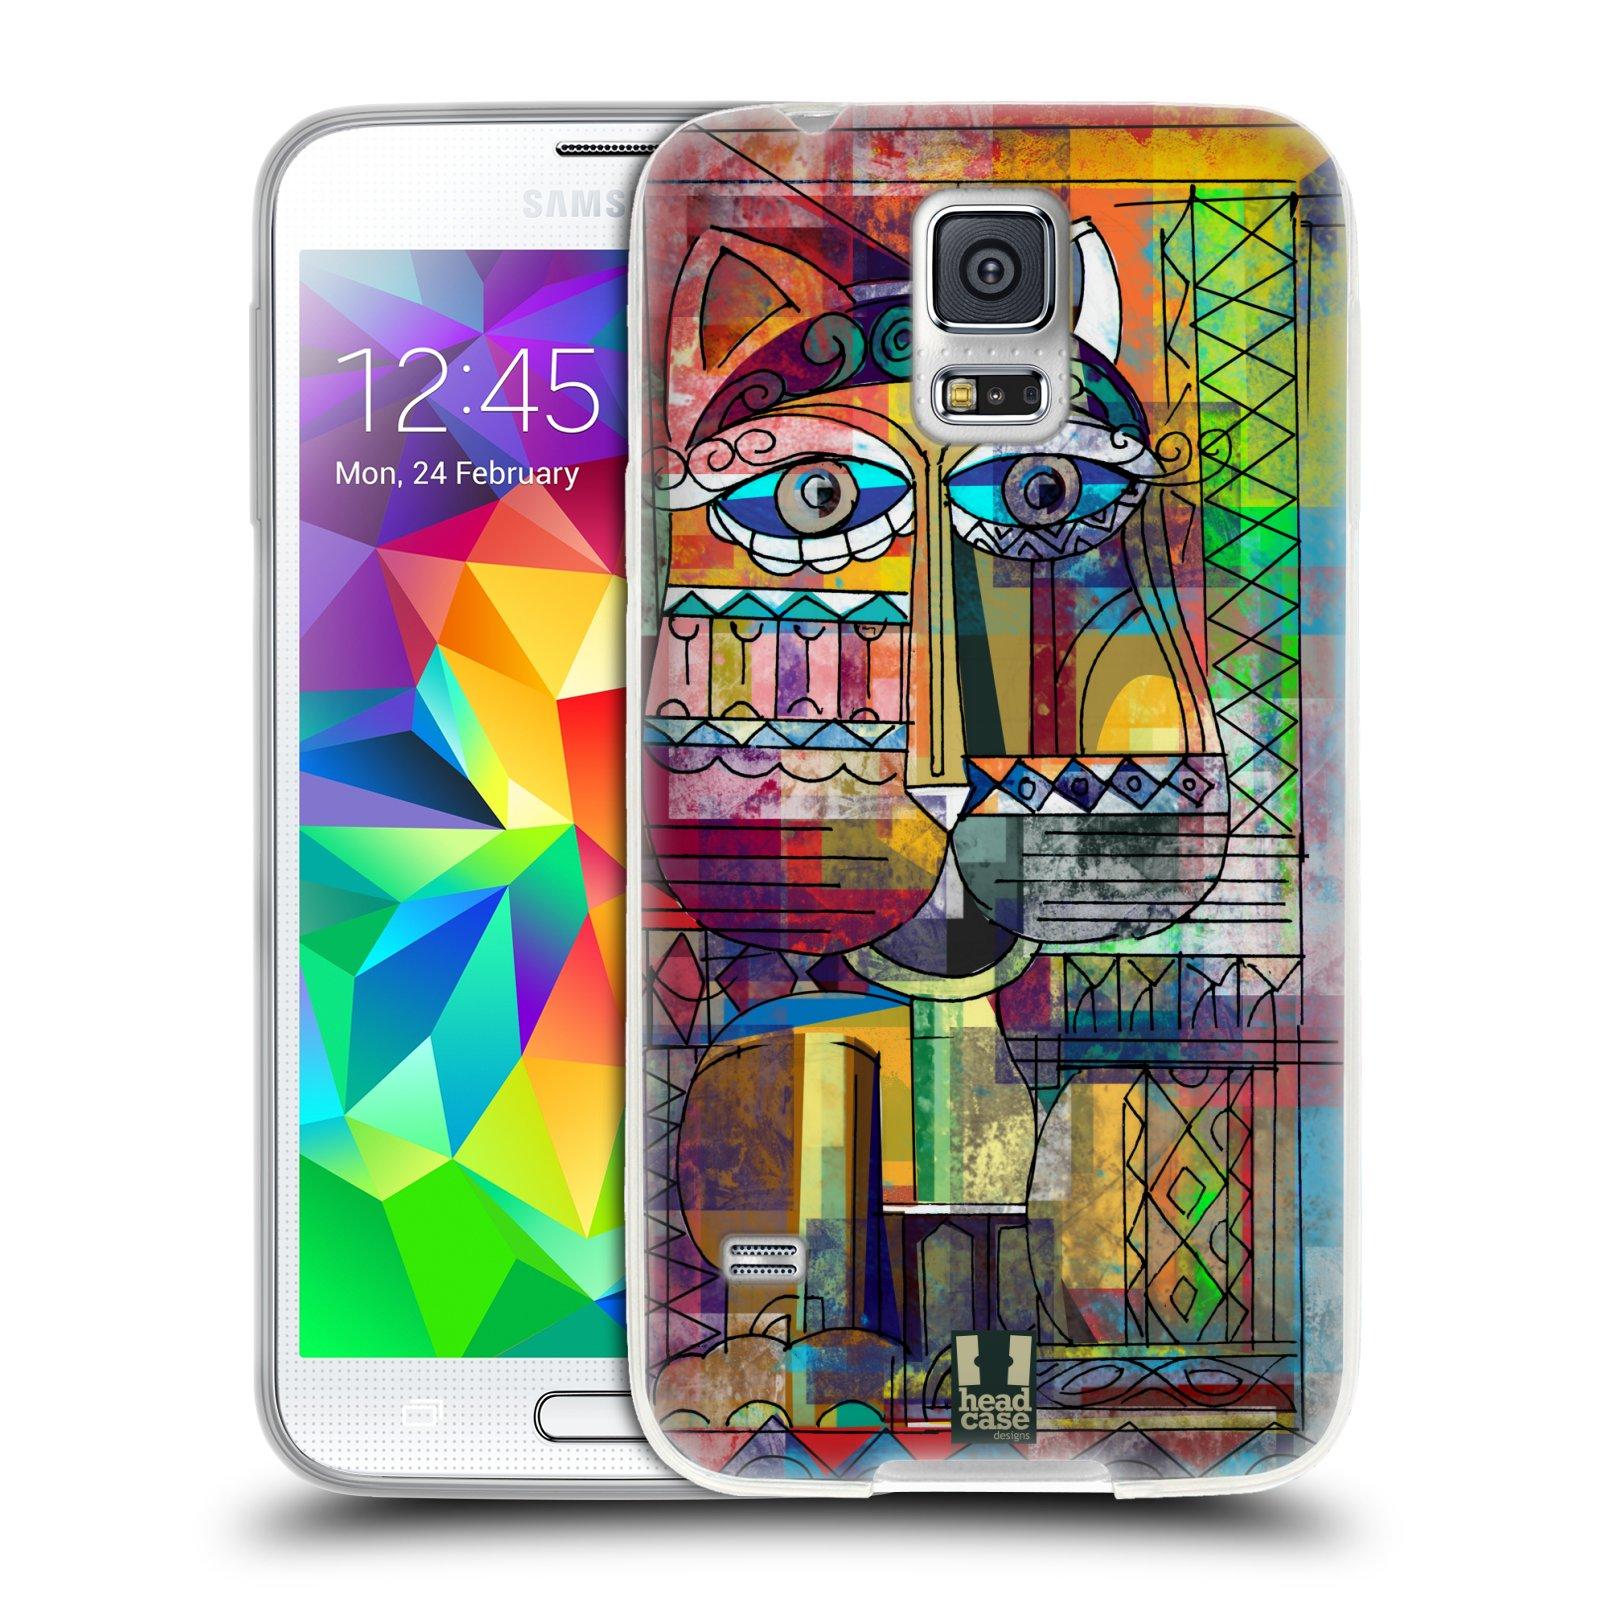 Silikonové pouzdro na mobil Samsung Galaxy S5 HEAD CASE AZTEC KORAT